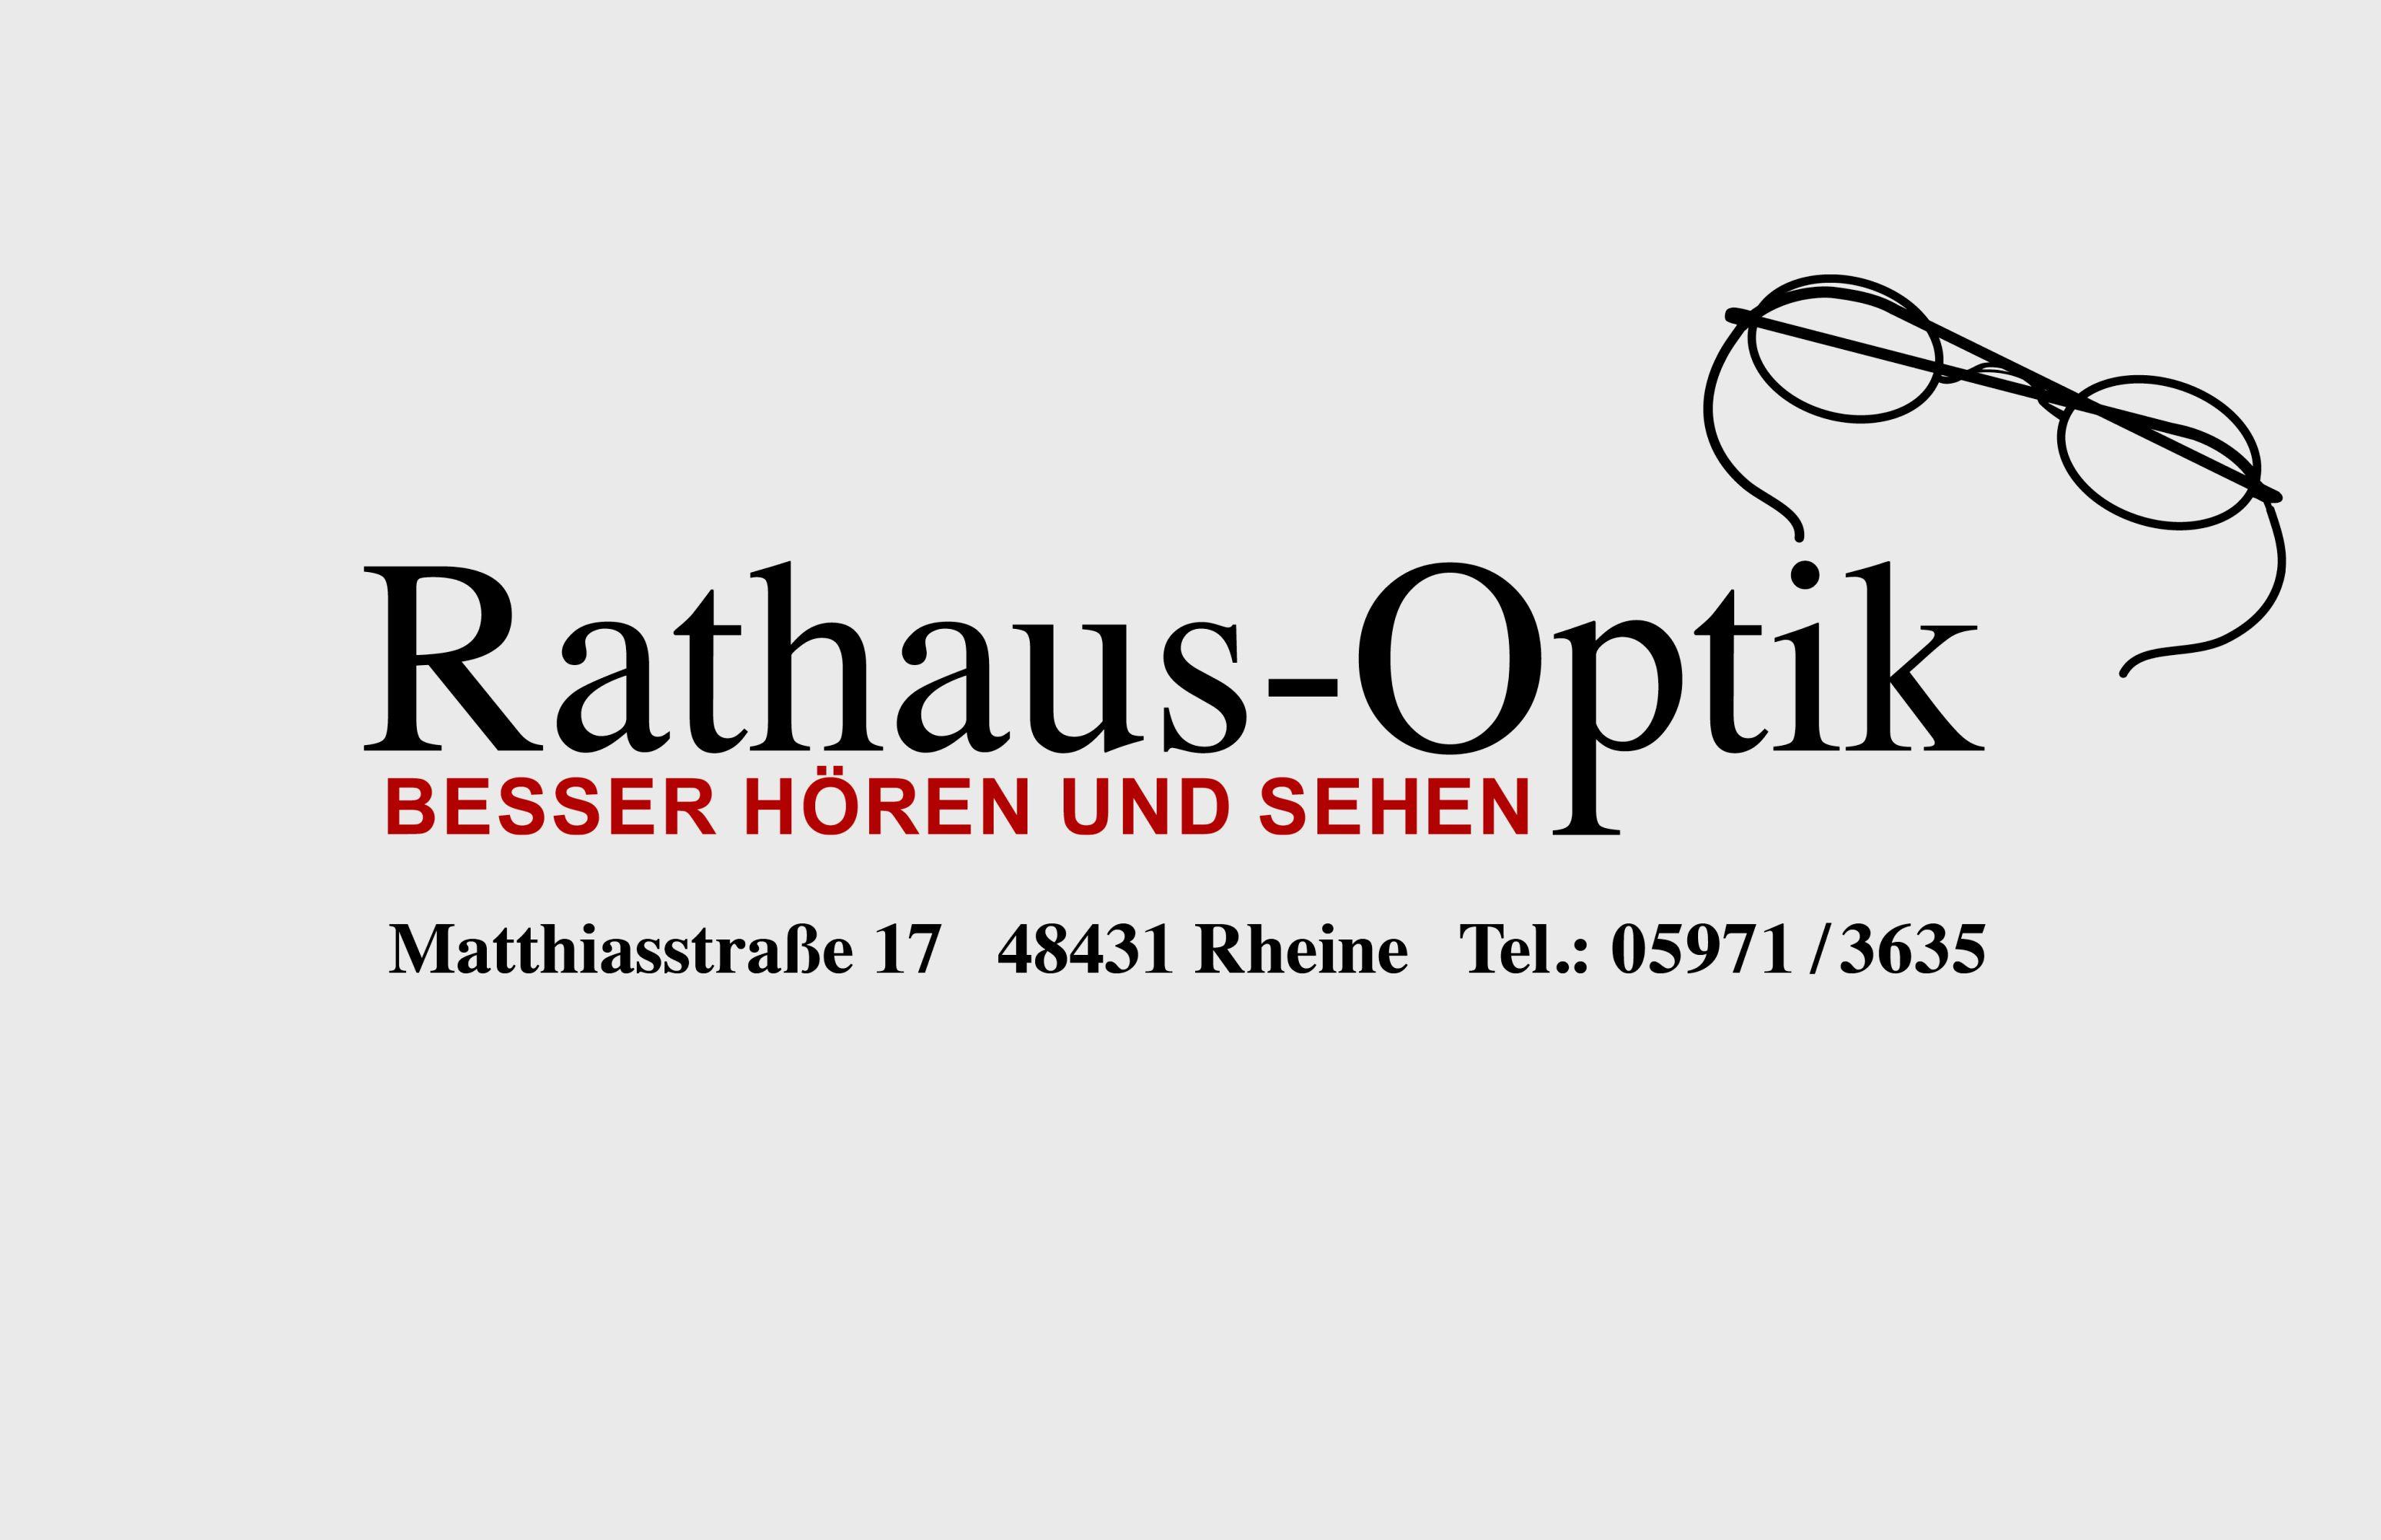 Rathaus-Optik, Löchte-Optik